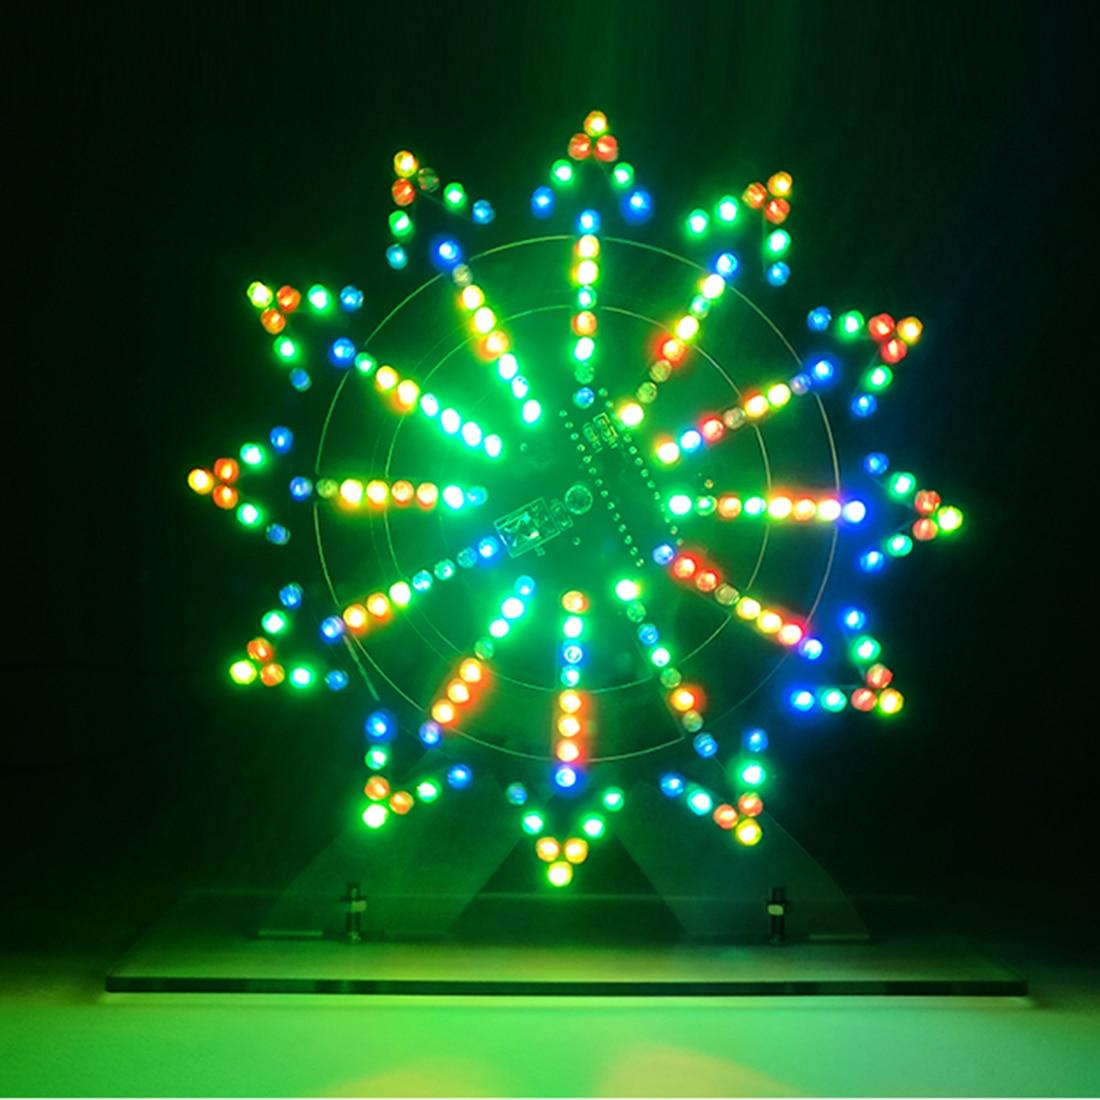 DIY Colorful LED Automatic Rotating Ferris Wheel Kit Electronic Components DIY Ferris Wheel Infrared Remote Ferris Wheel Decor